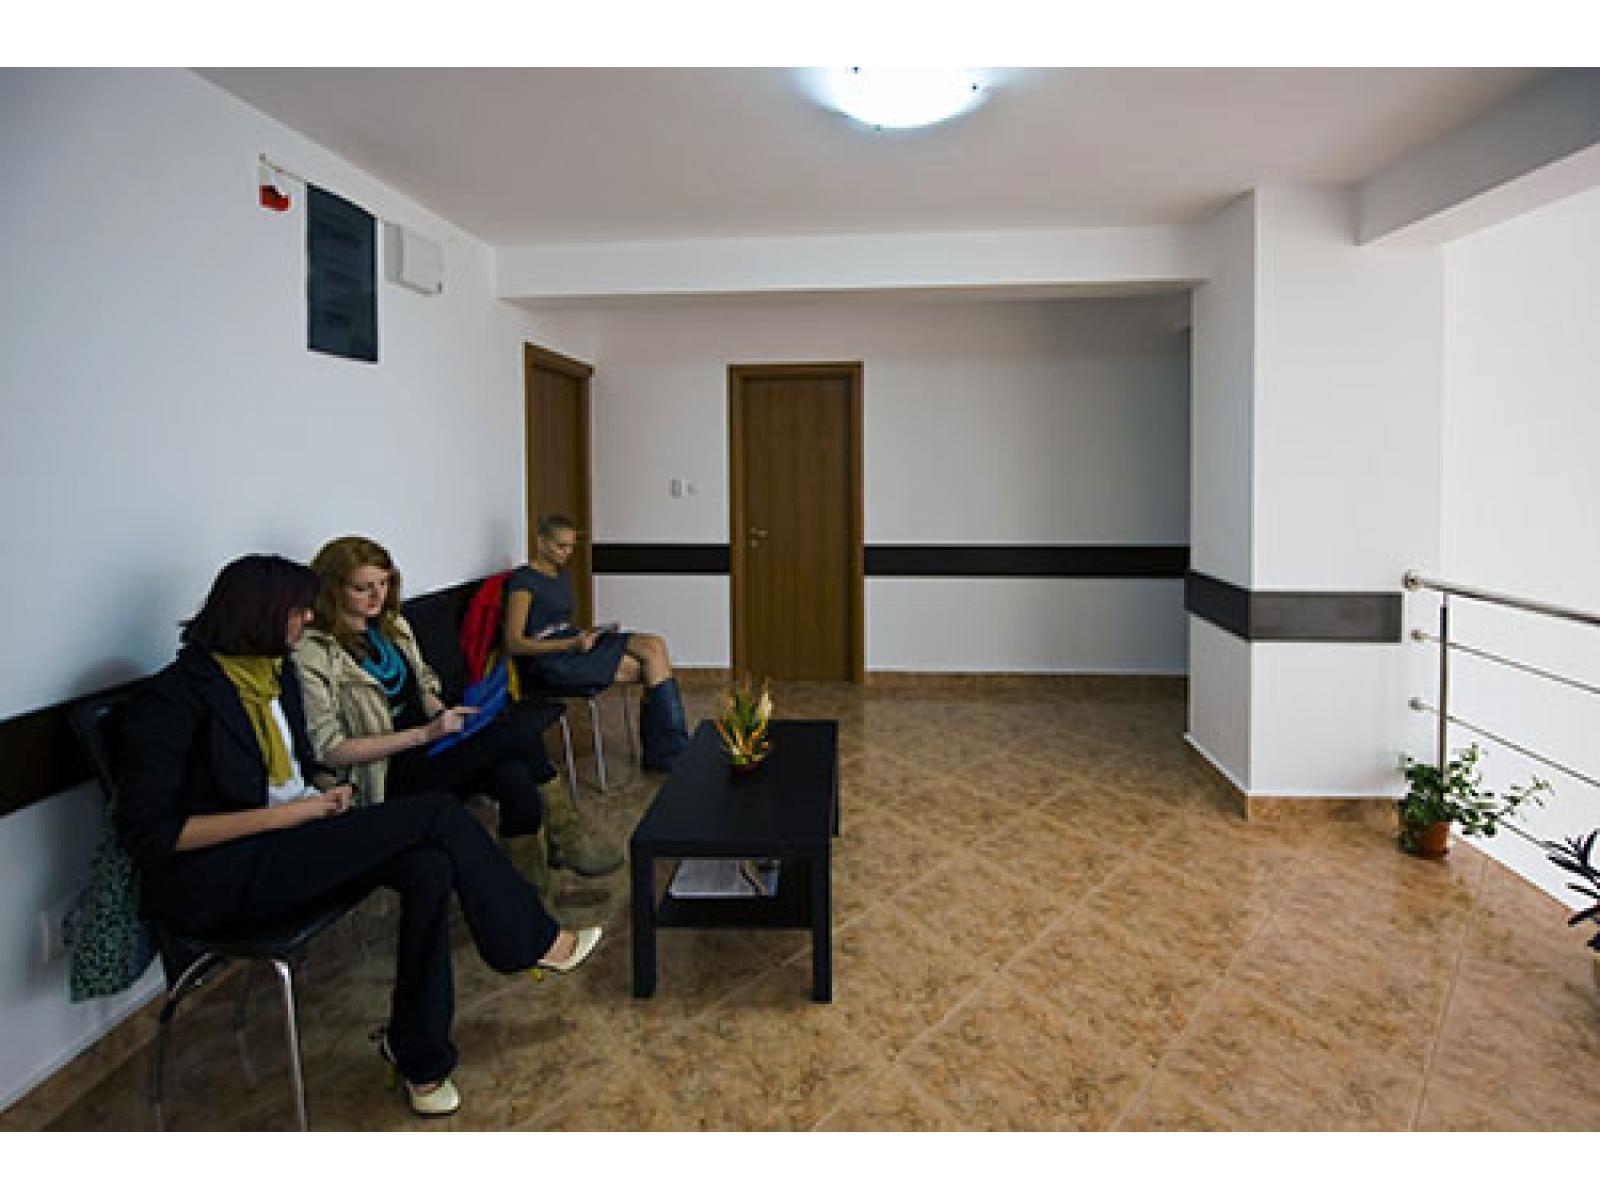 Centrul Medical Promed System Targoviste - 148_sala-asteptare.jpg